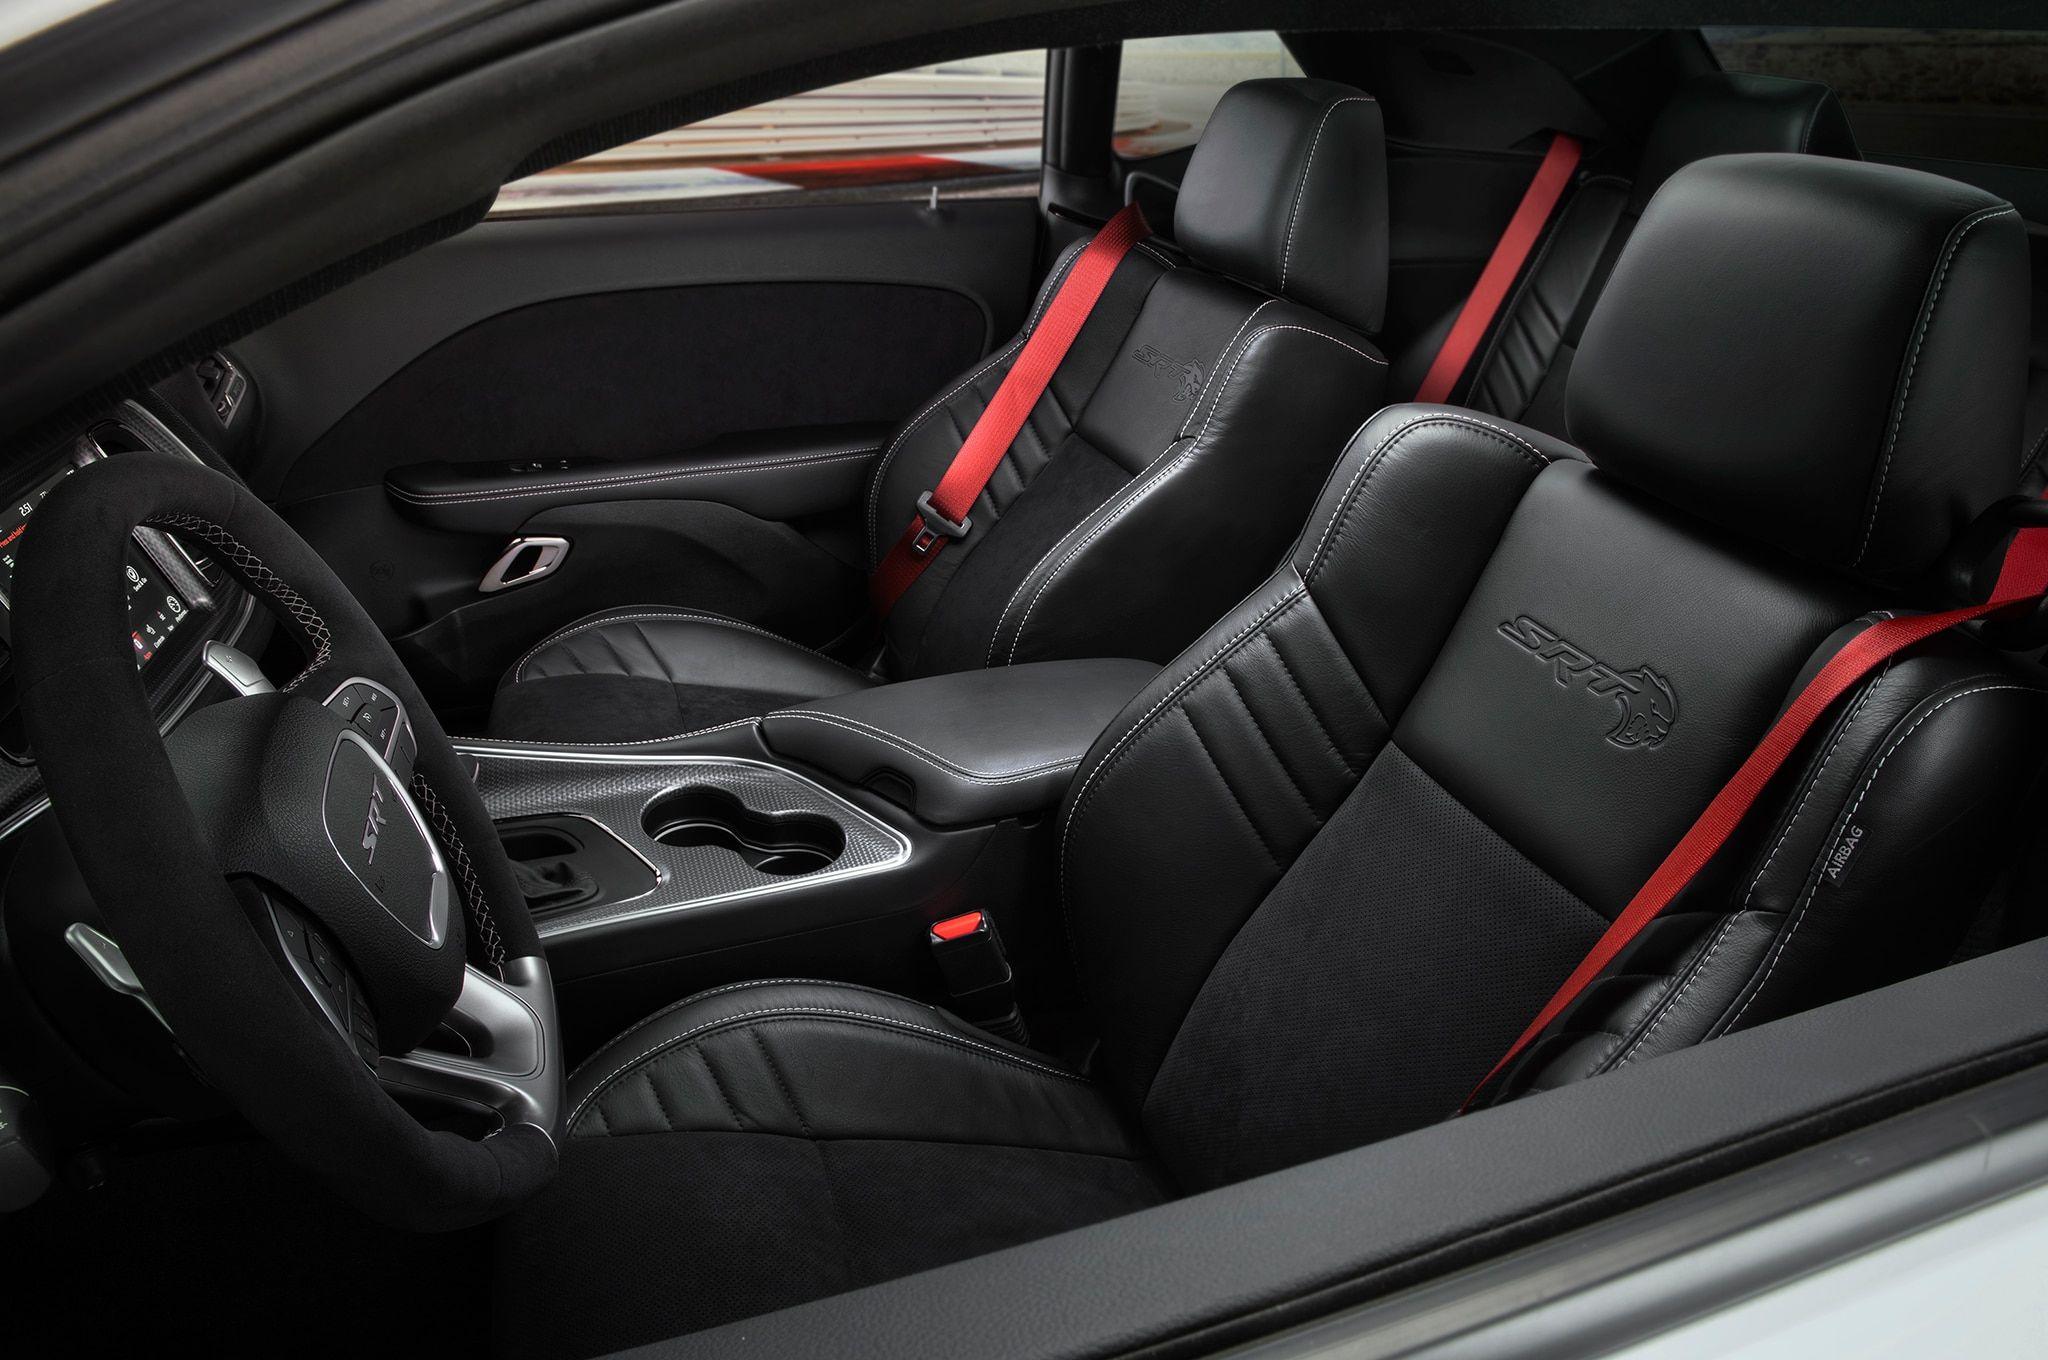 Dodge Challenger Hellcat Redeye Dodge Challenger Srt Dodge Charger Interior Dodge Challenger Srt Hellcat